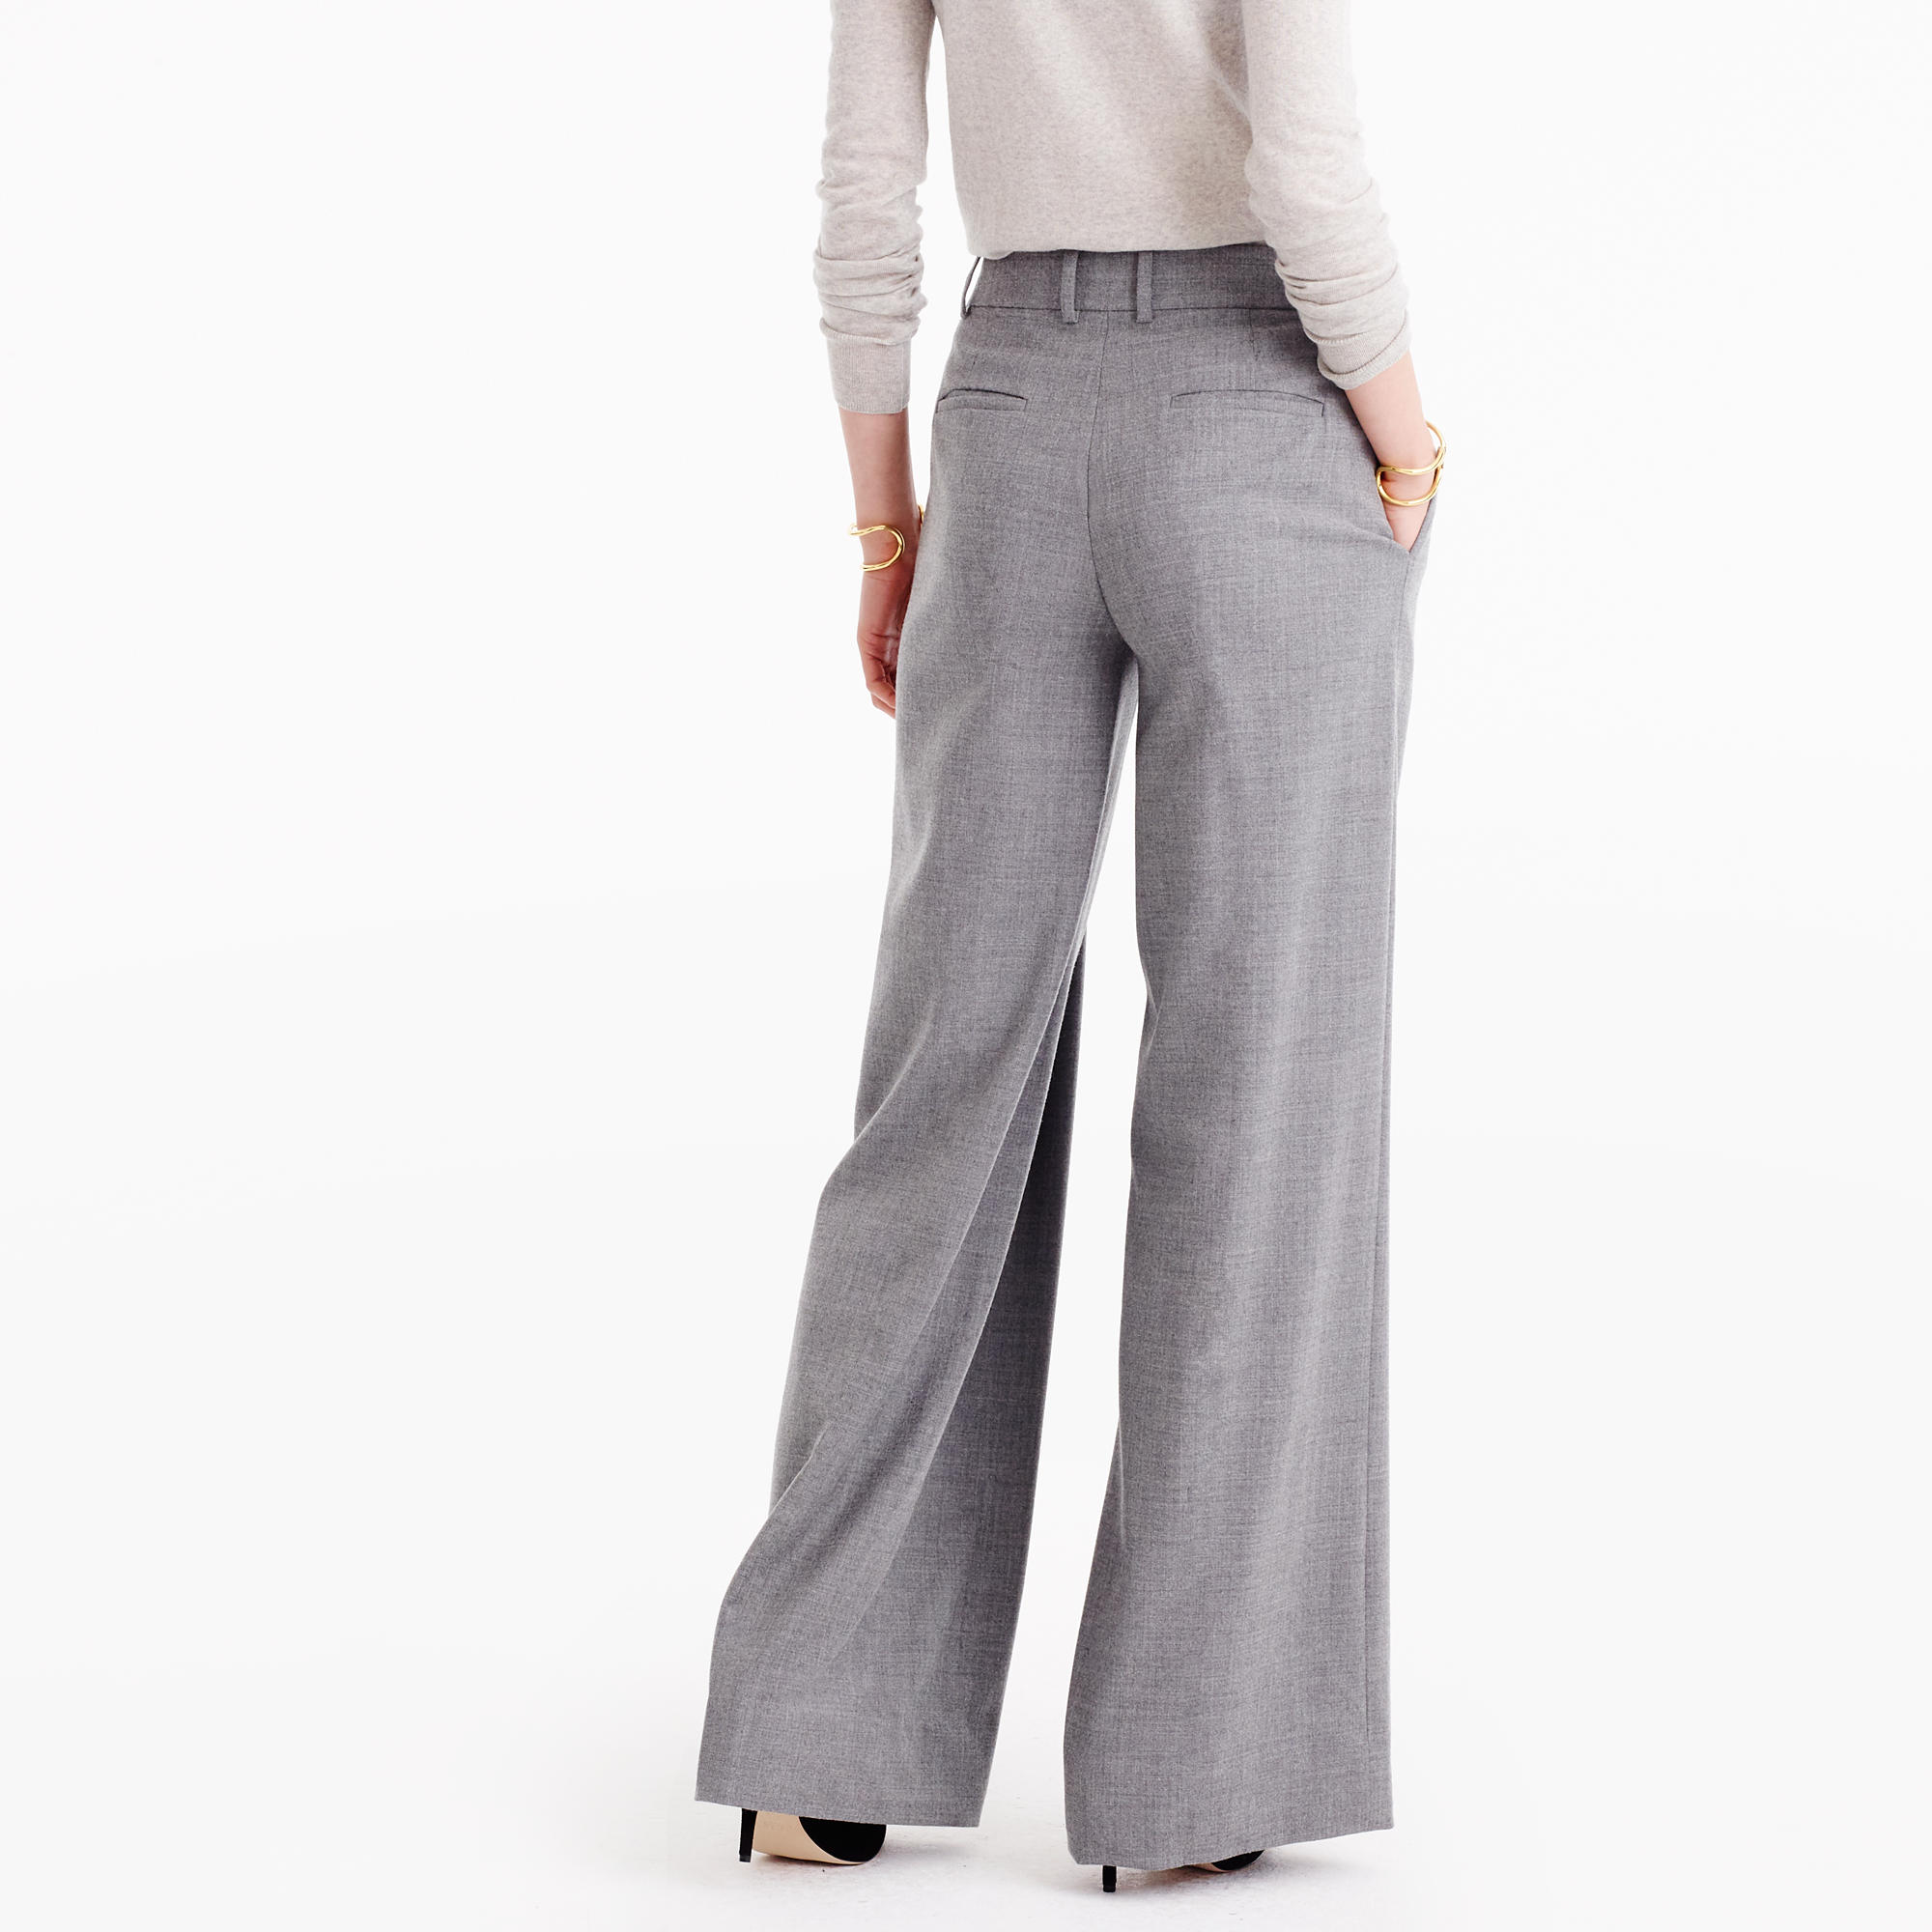 Wide-Leg Pant In Wool : Women's Pants | J.Crew